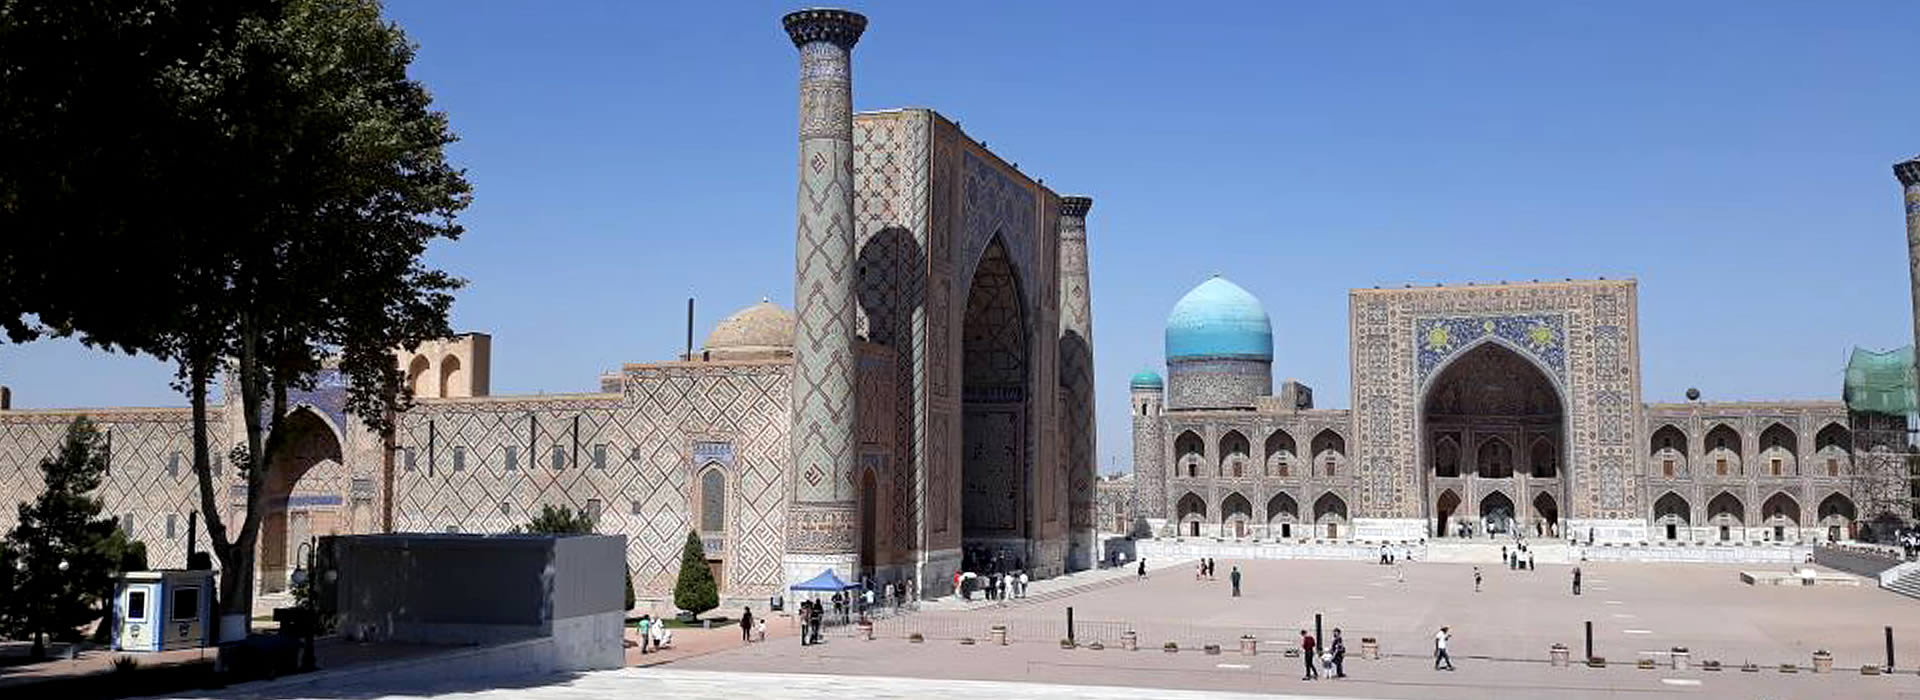 pic-banner-usbekistan-2019-01